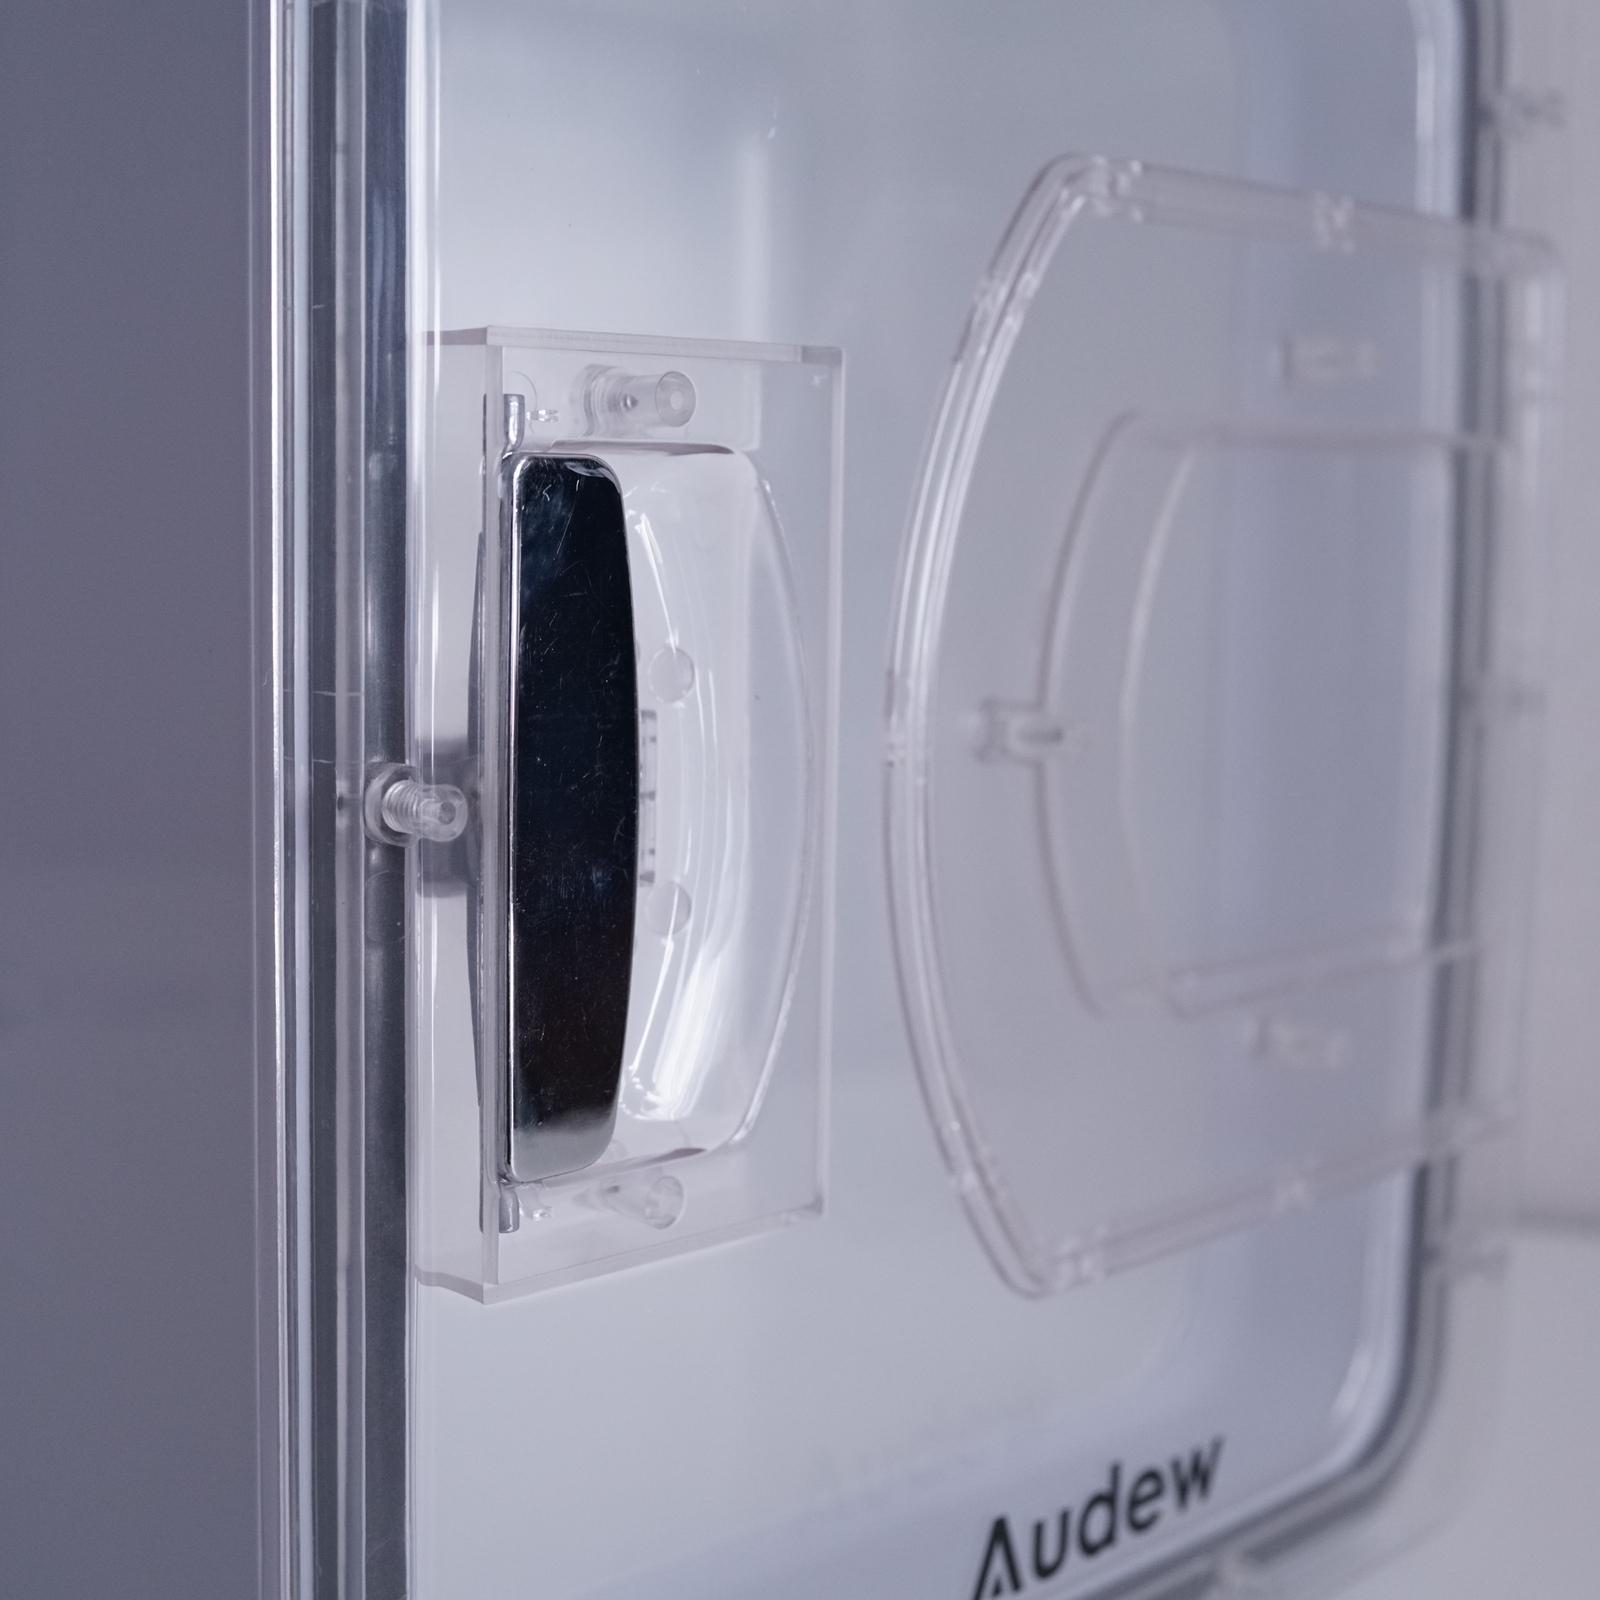 Audewのポータブル冷蔵庫CW1-8Lレビュー